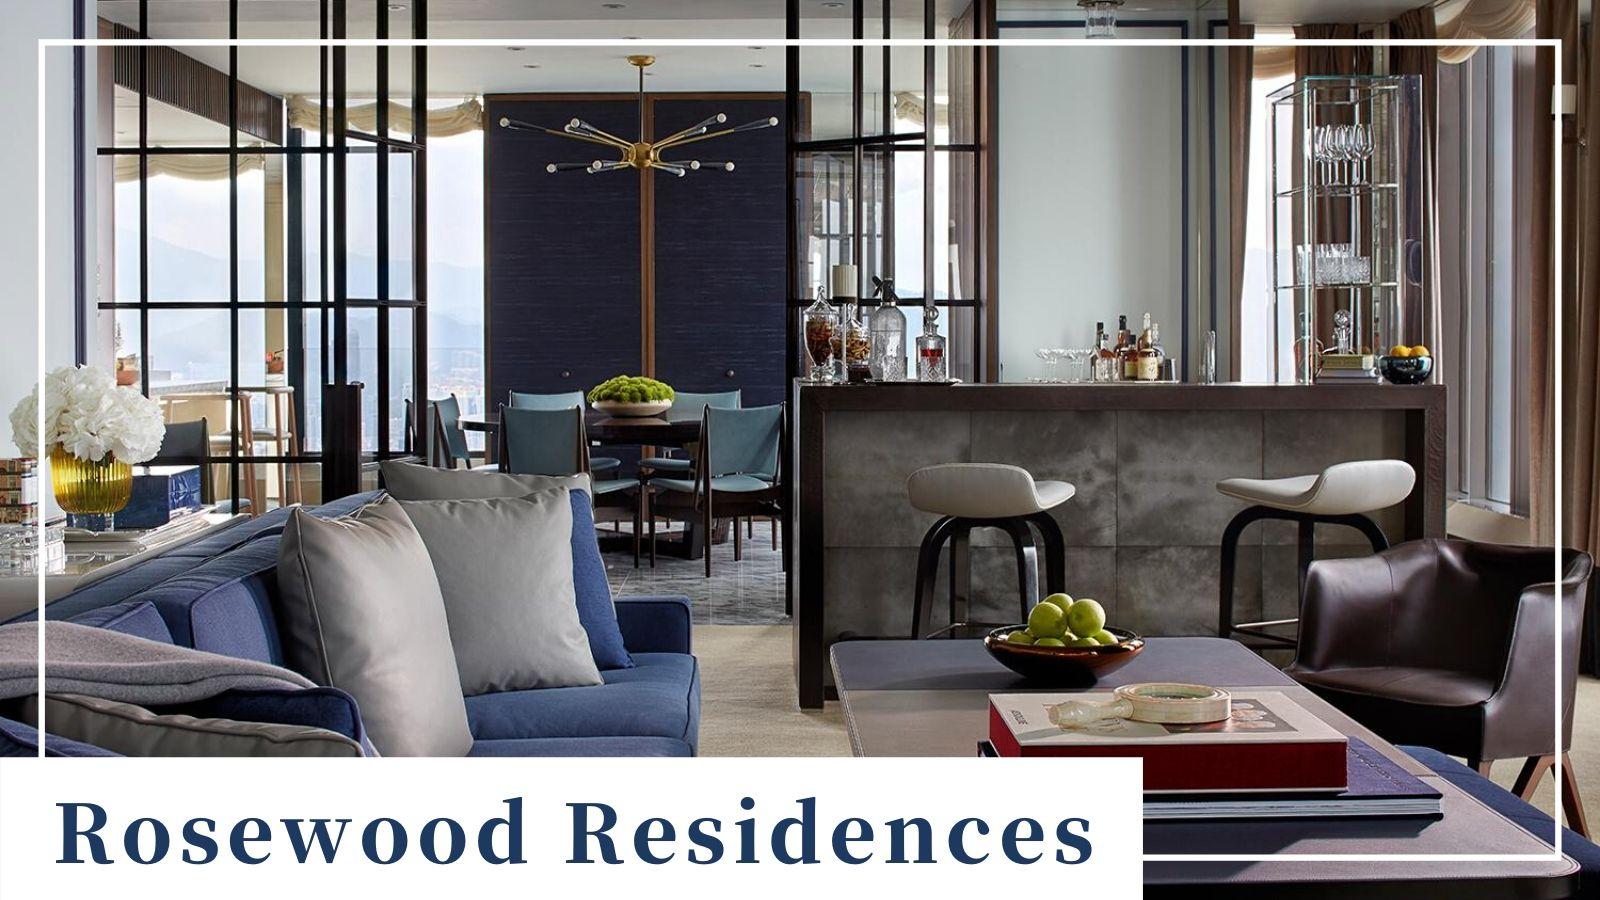 Rosewood Residences